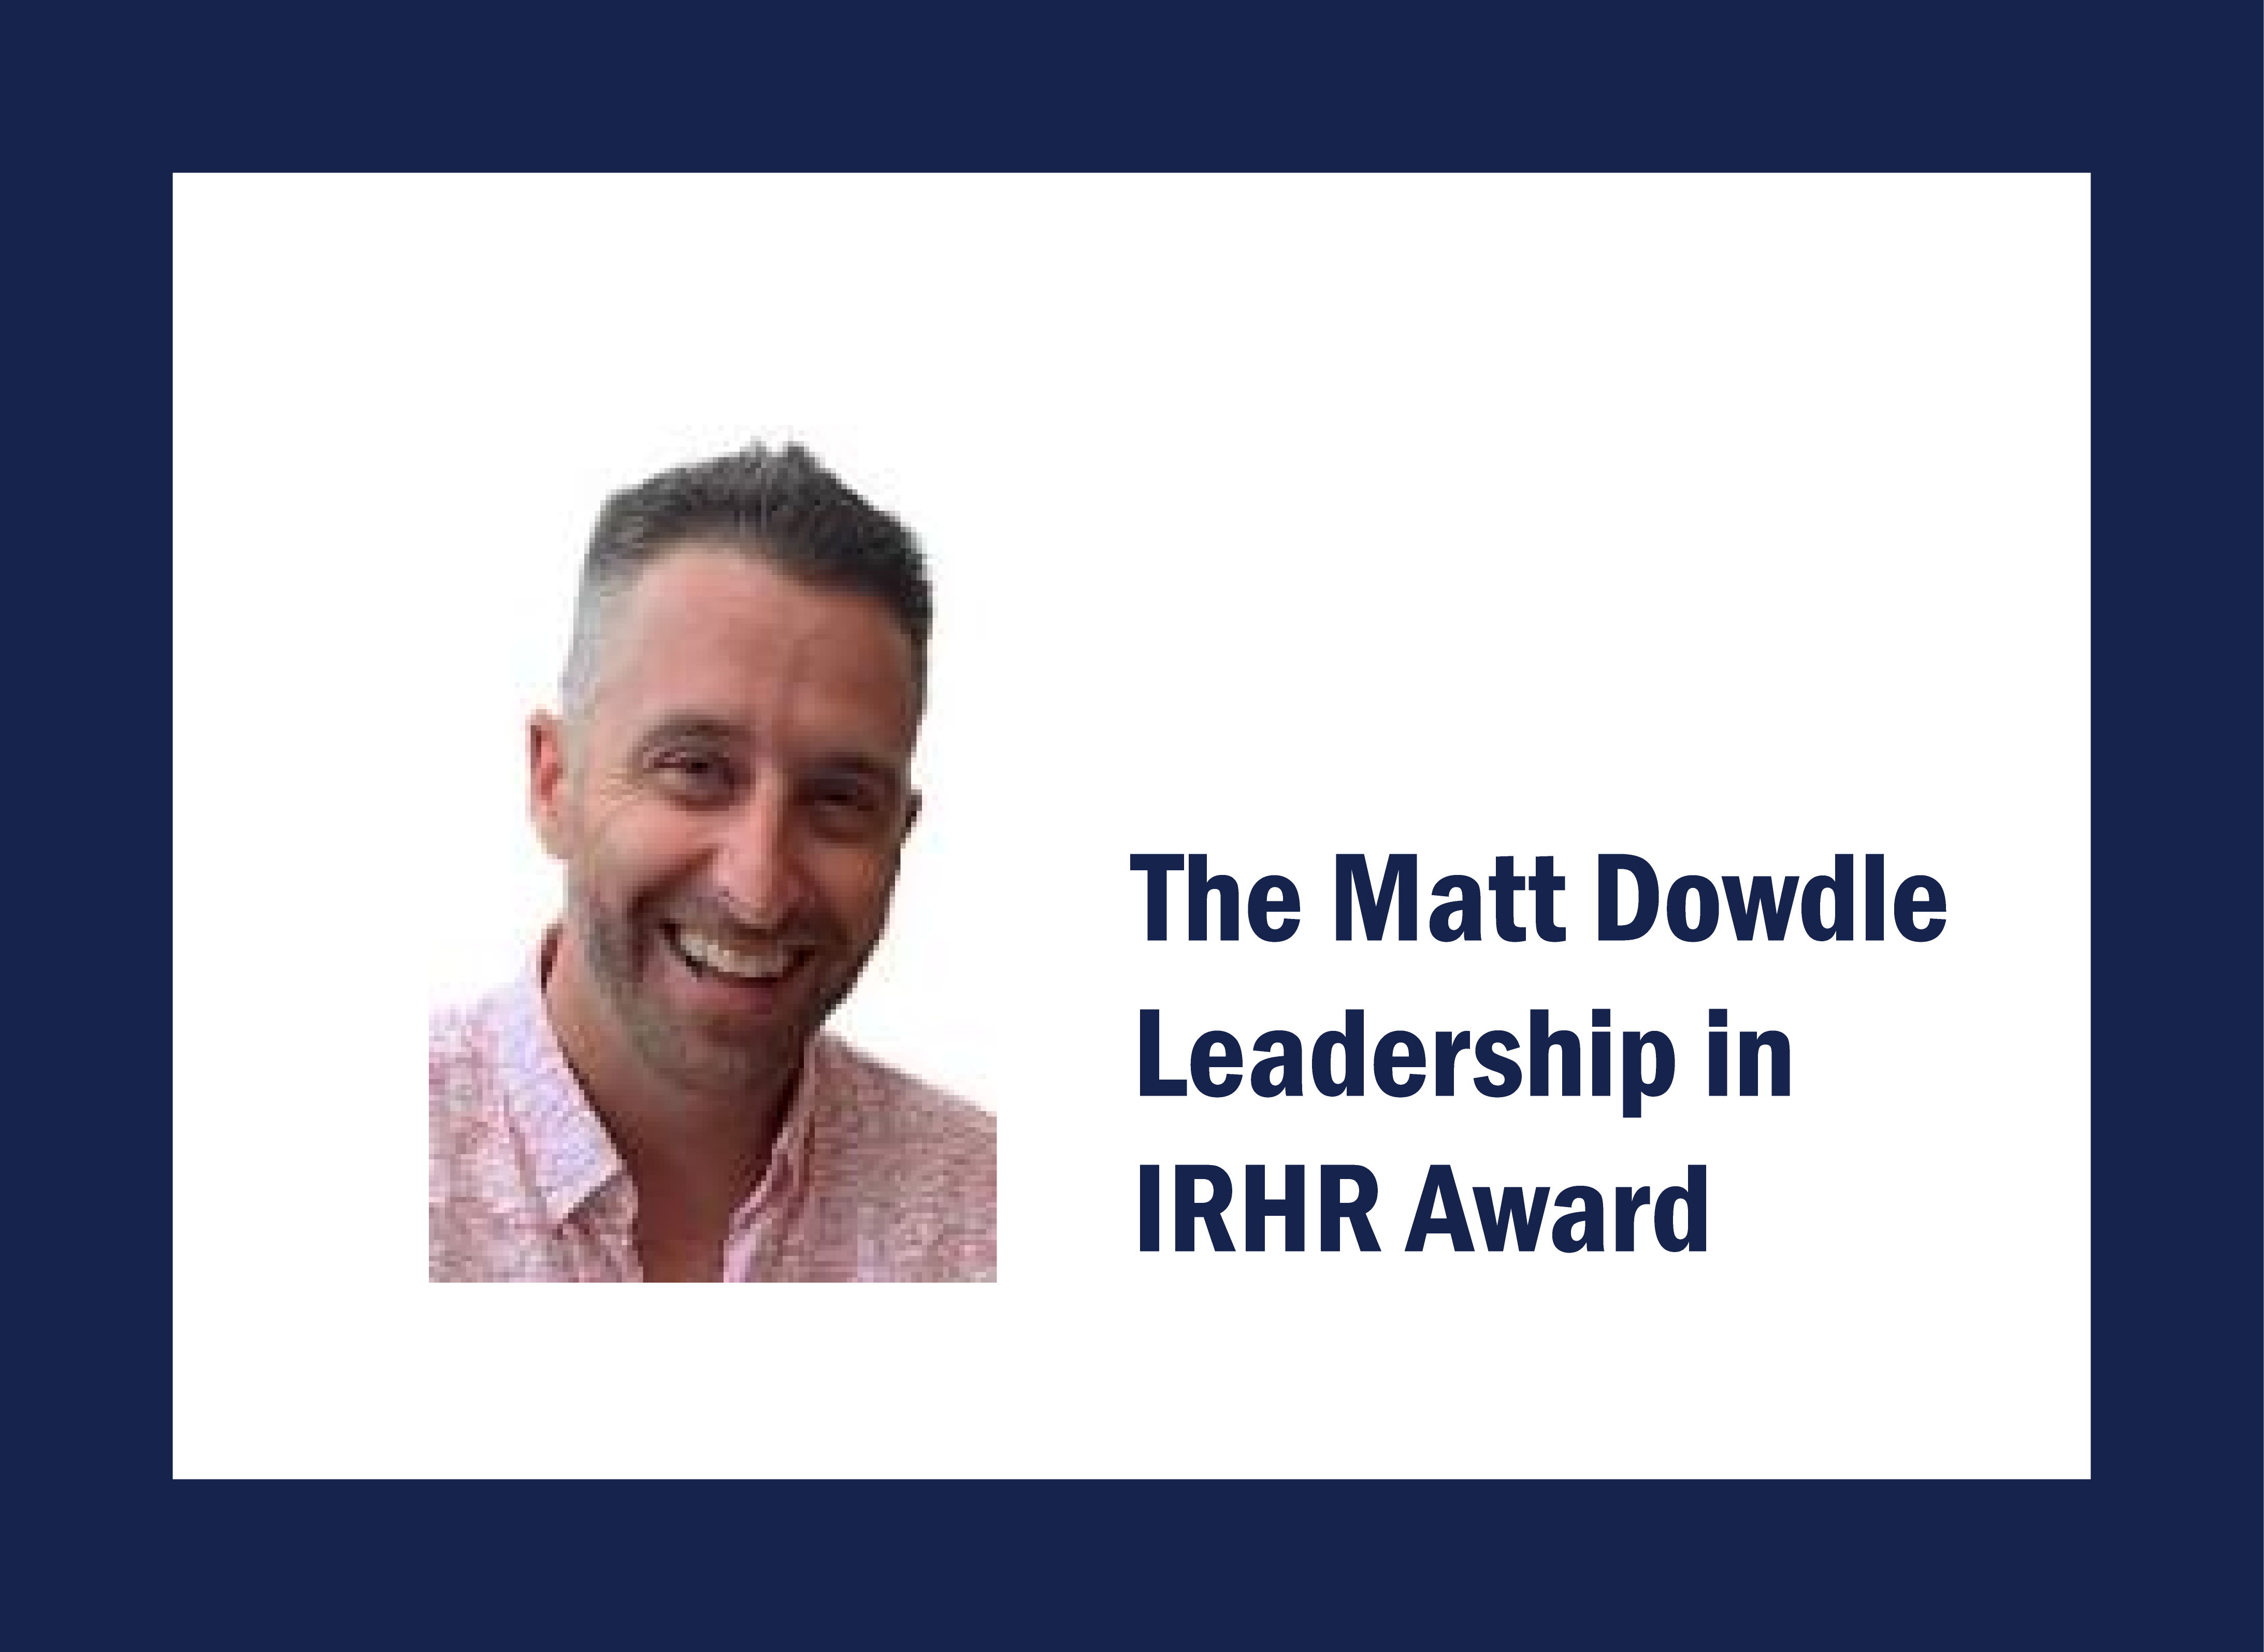 The Matt Dowdle Leadership in IRHR Award